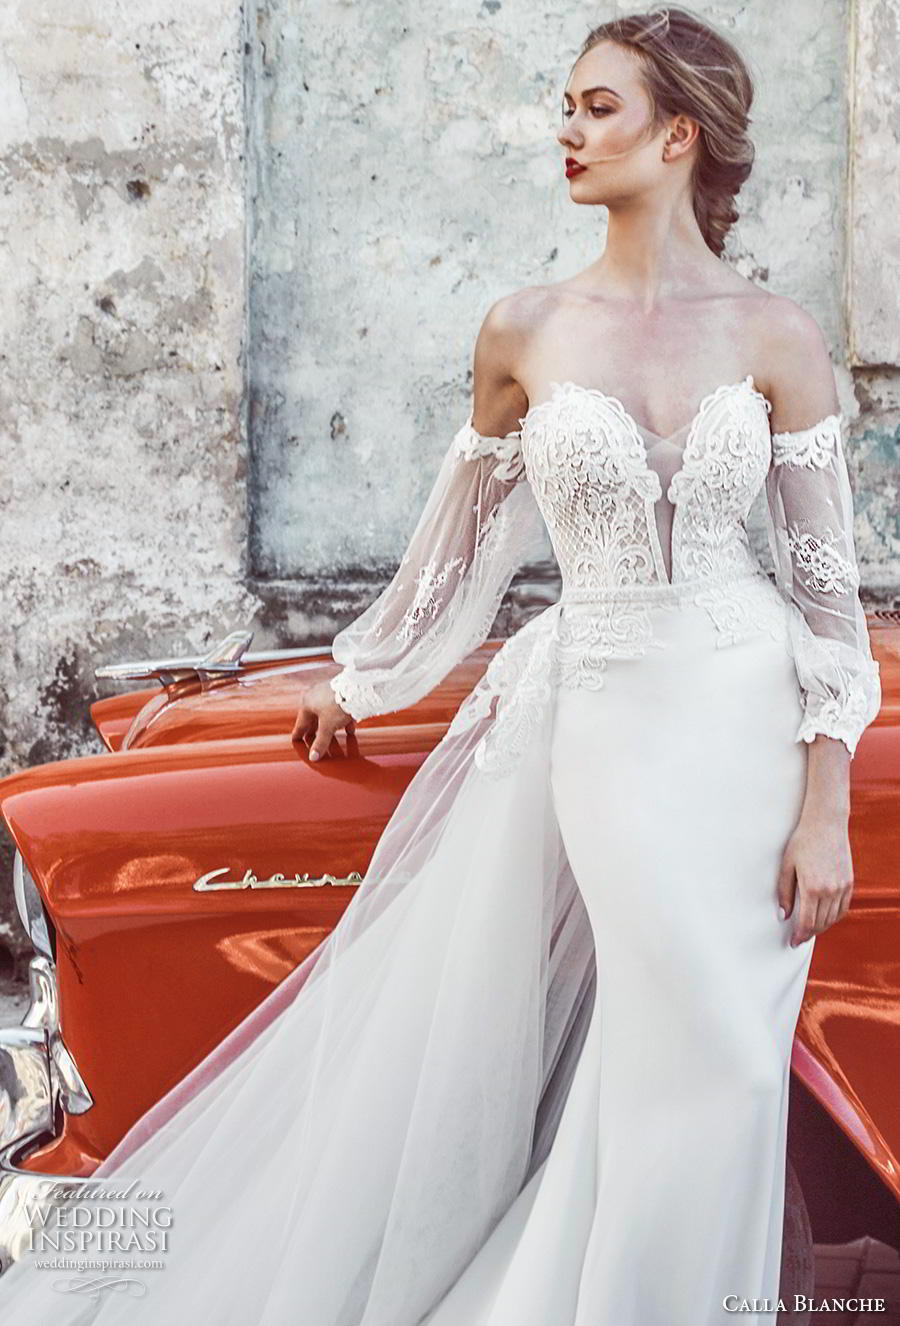 calla blanche fall 2018 bridal long bishop sleeves off shoulder deep plunging sweetheart neckline heavily embellished bodice elegant sheath wedding dress royal train (2) zv